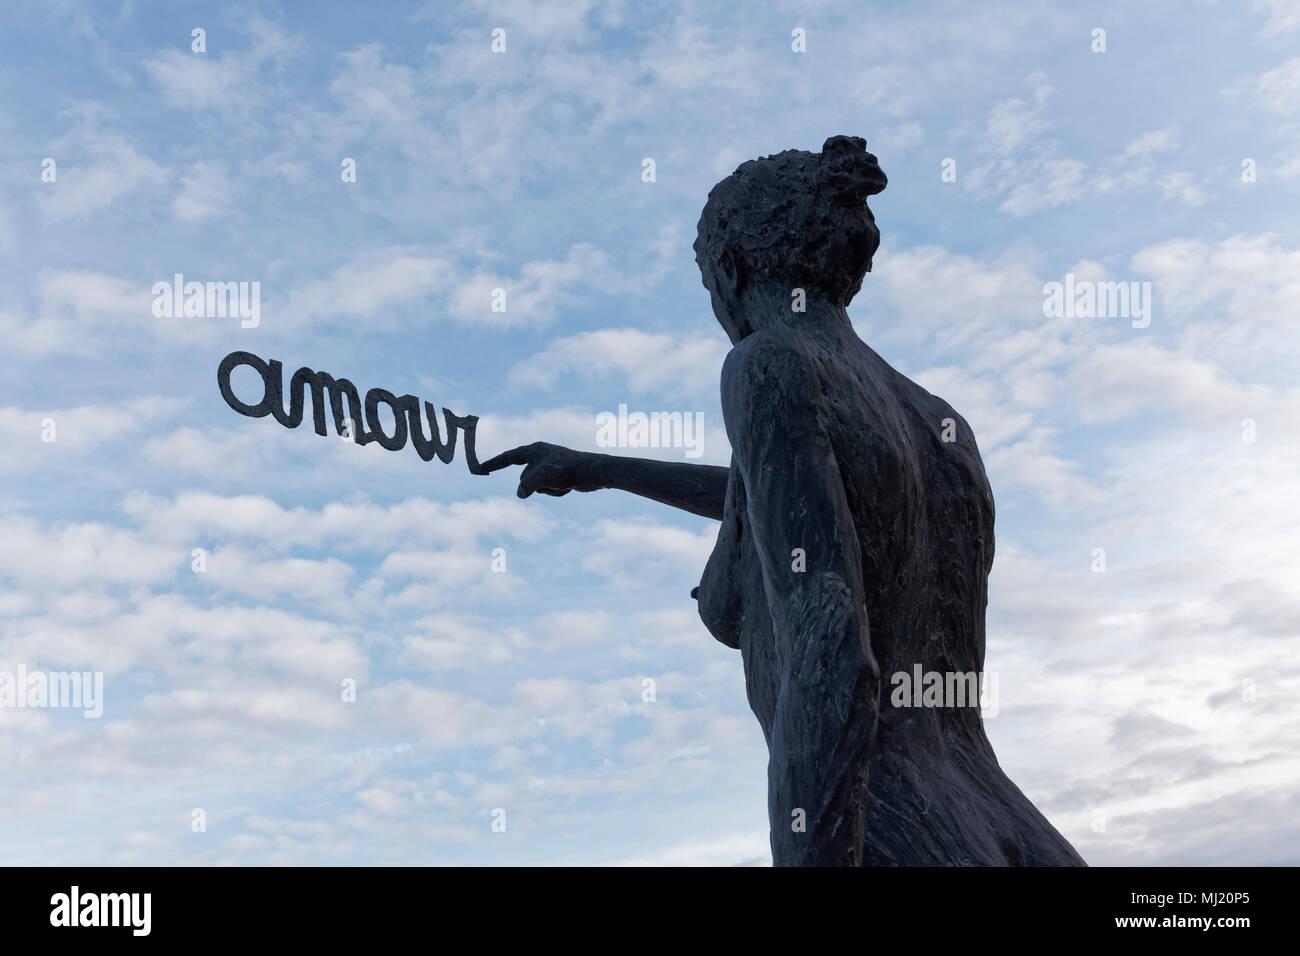 Woman writes French word Amour, Love, in the sky, bronze sculpture by Belgian sculptor Linde Ergo, De Haan, West-Flanders - Stock Image